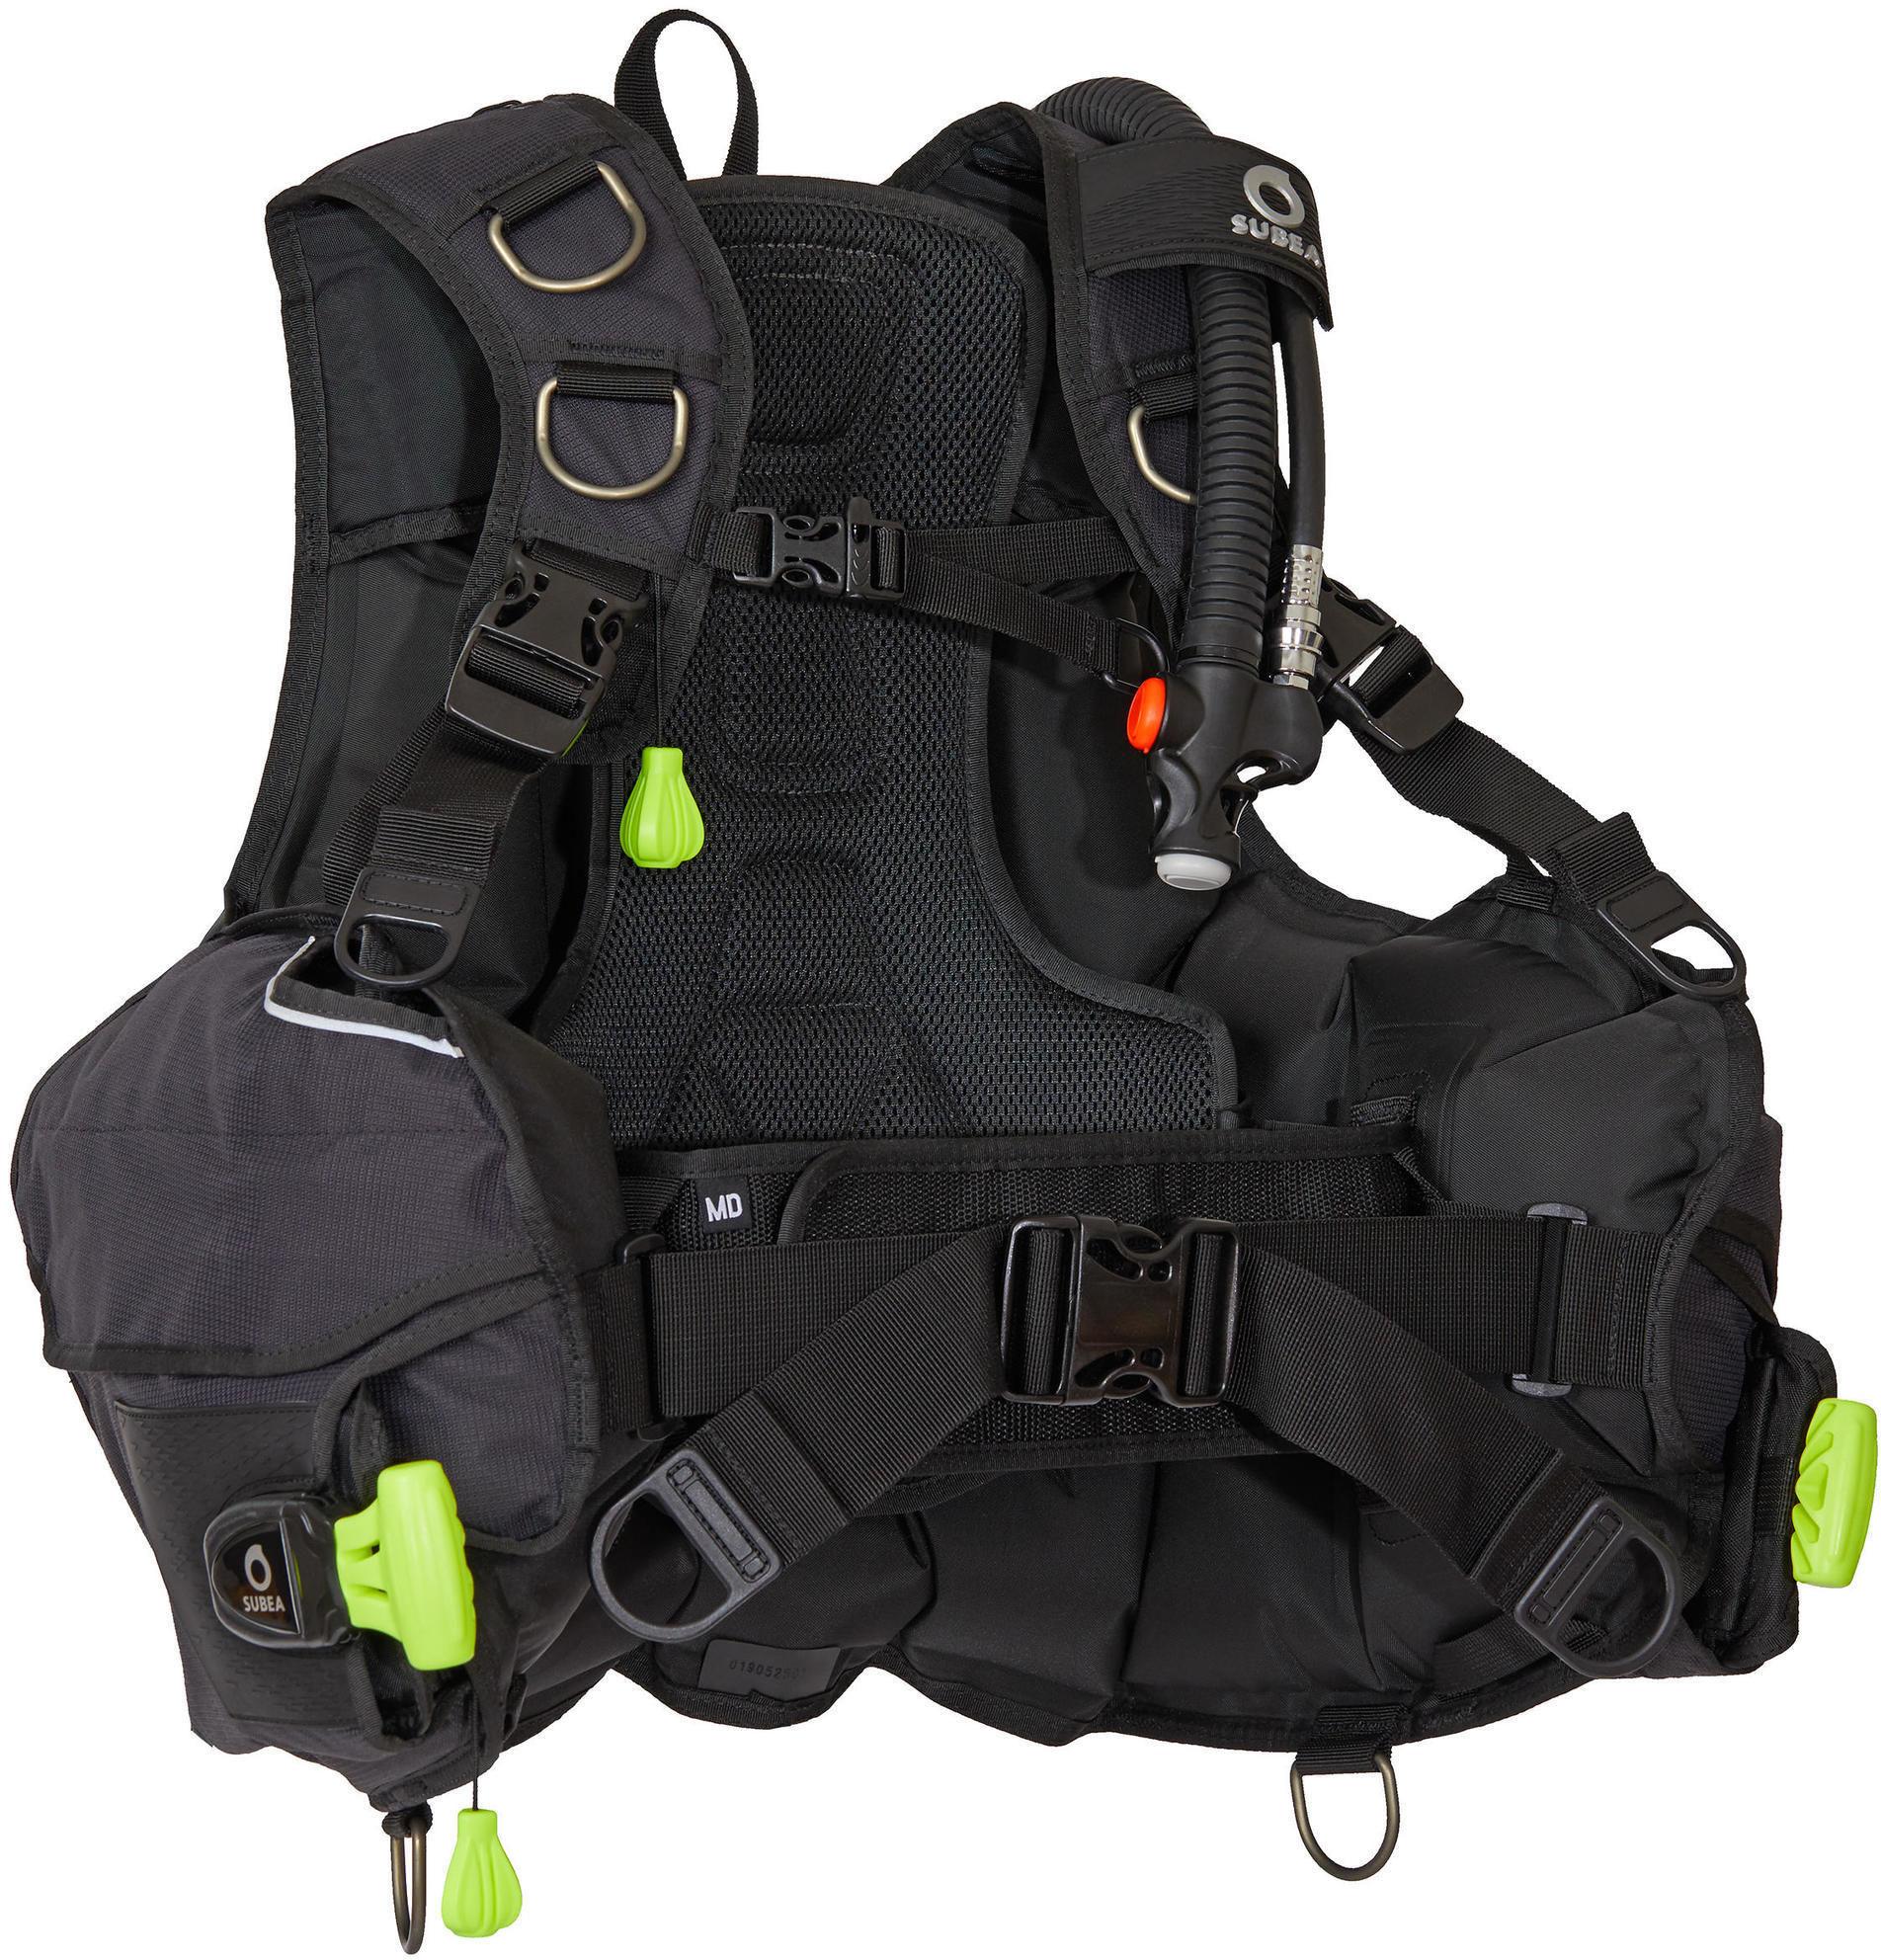 Jacket nurkowy klasyczny SCD 500 model 2020